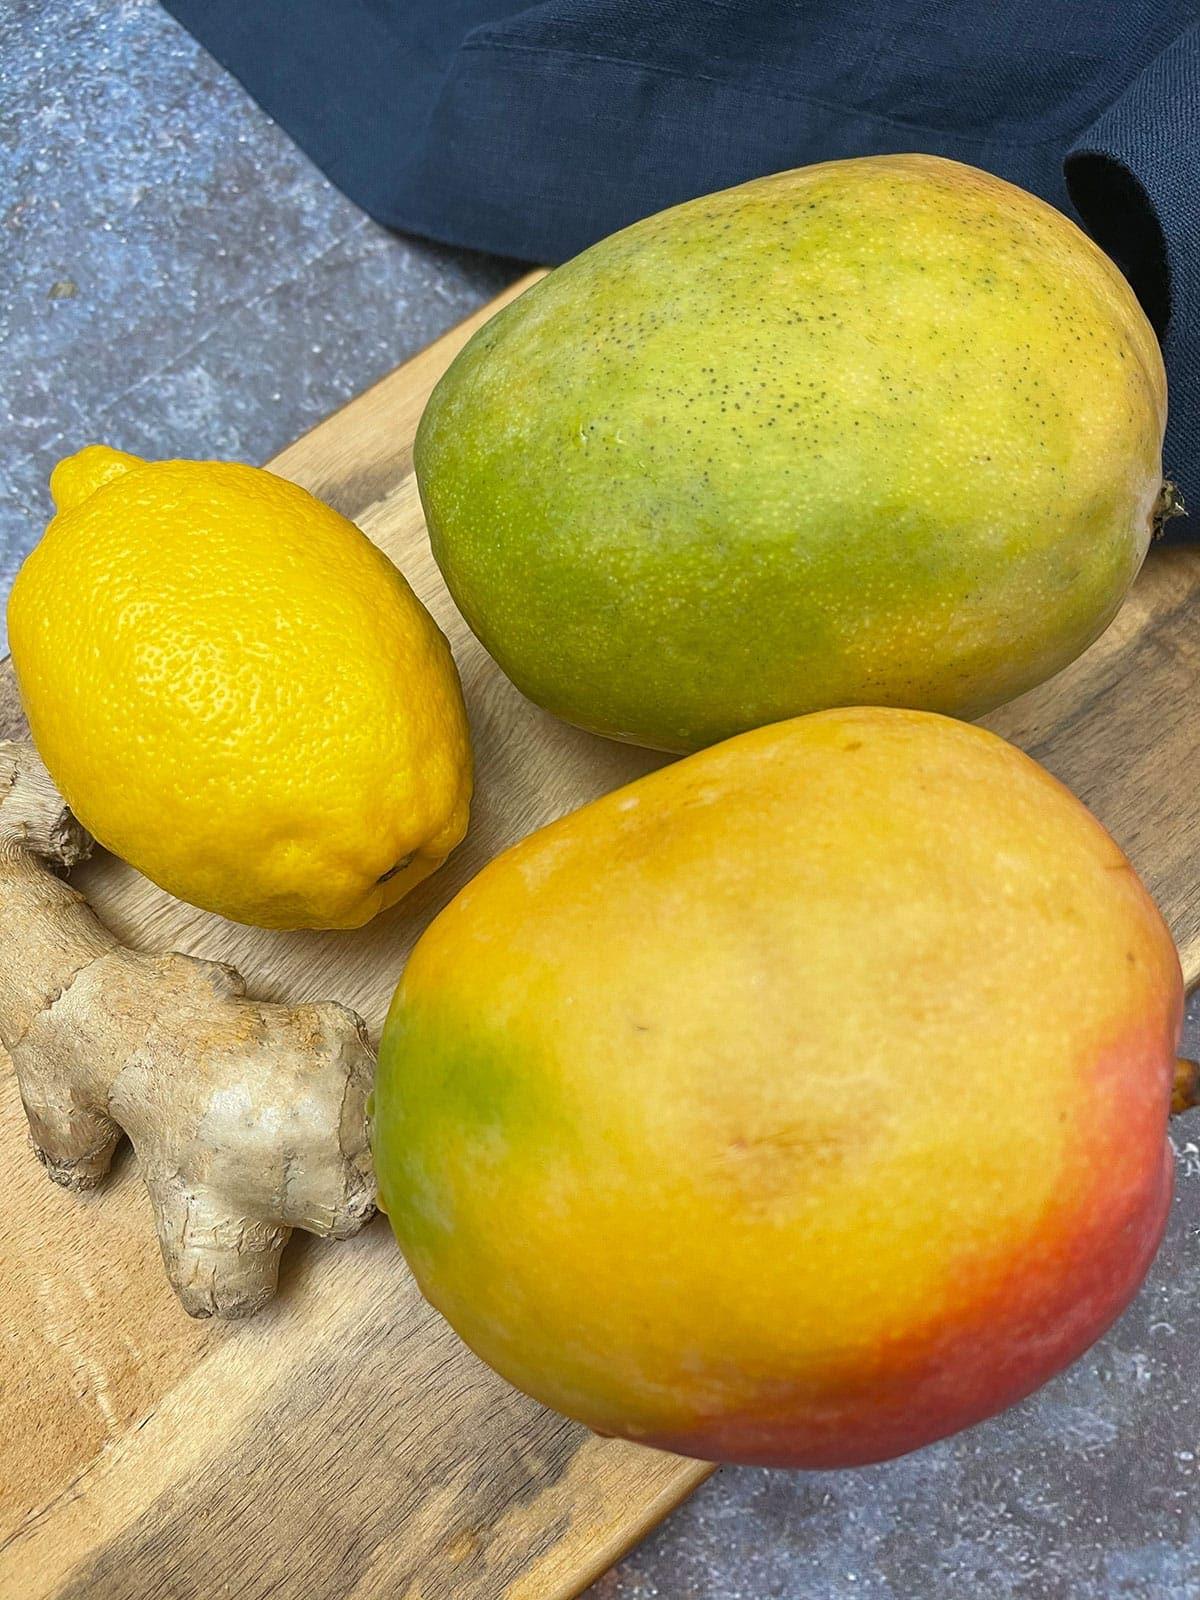 Ingredients for mango juice